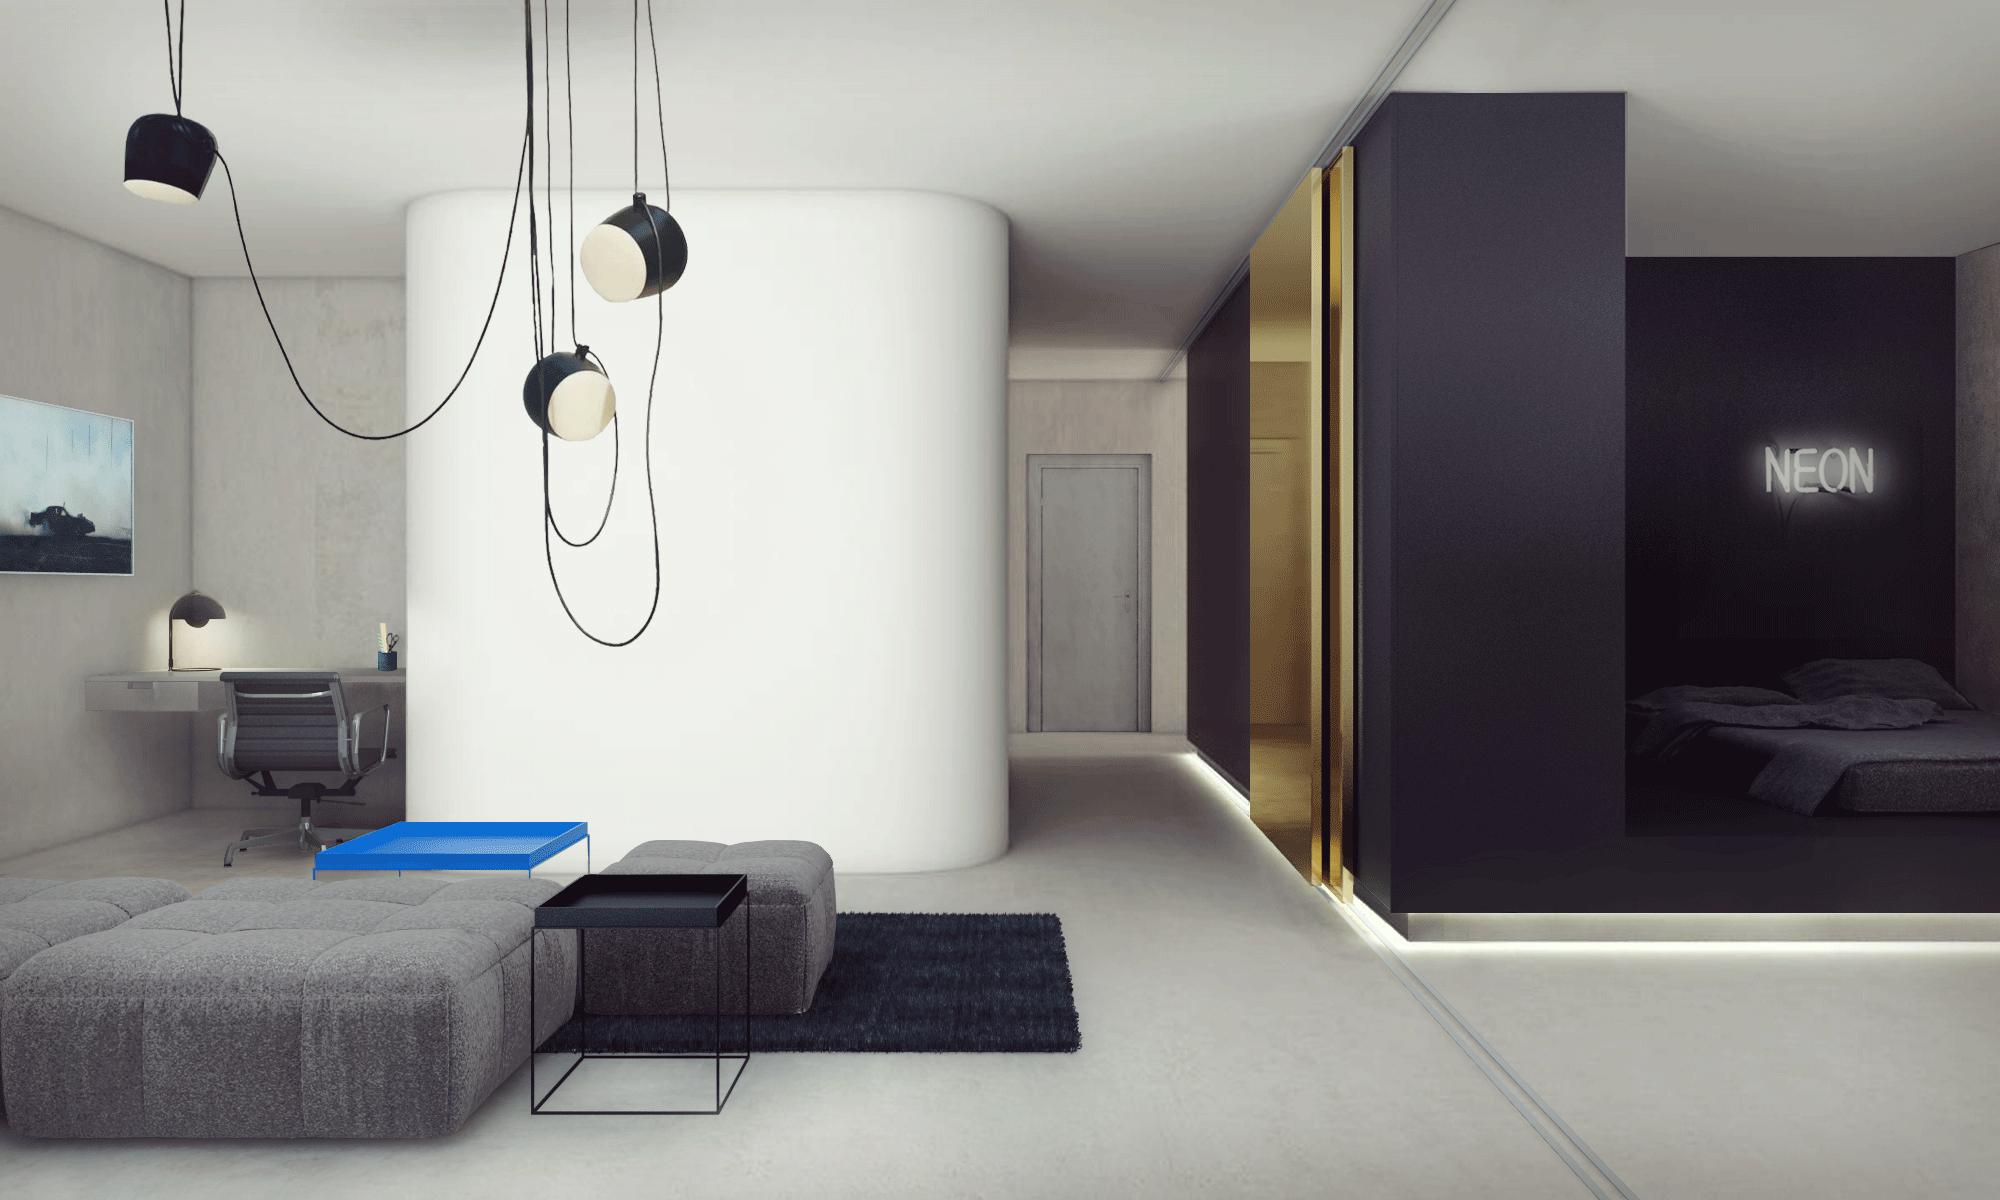 interurban_apartament_s_gdynia_01